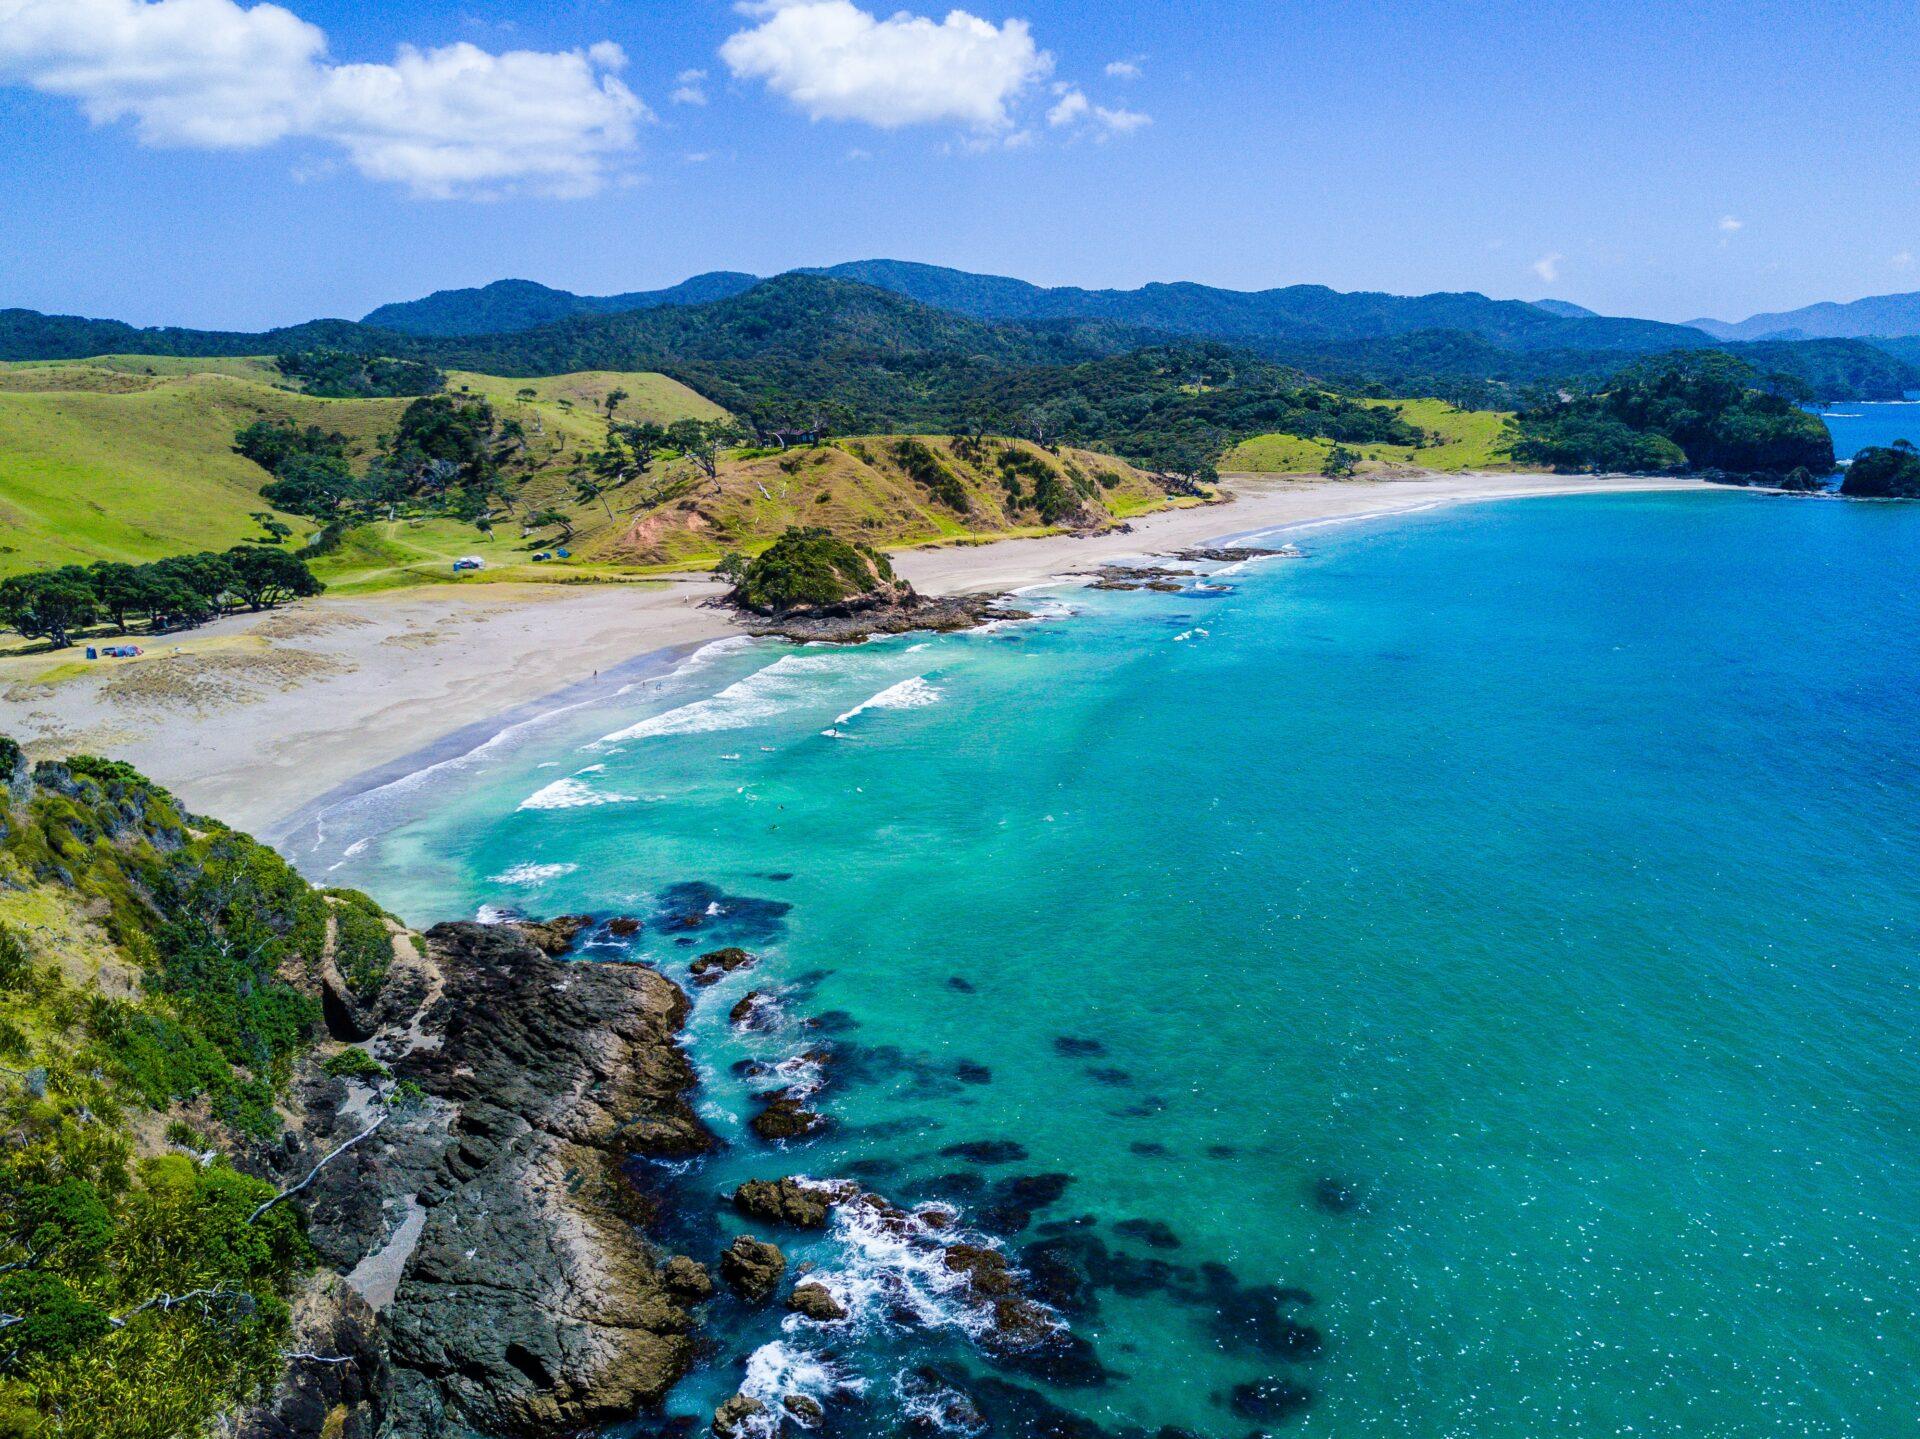 Couchsurfing in New Zealand - Sustainable Tourism - TravelRebel - Travelblog Belgium